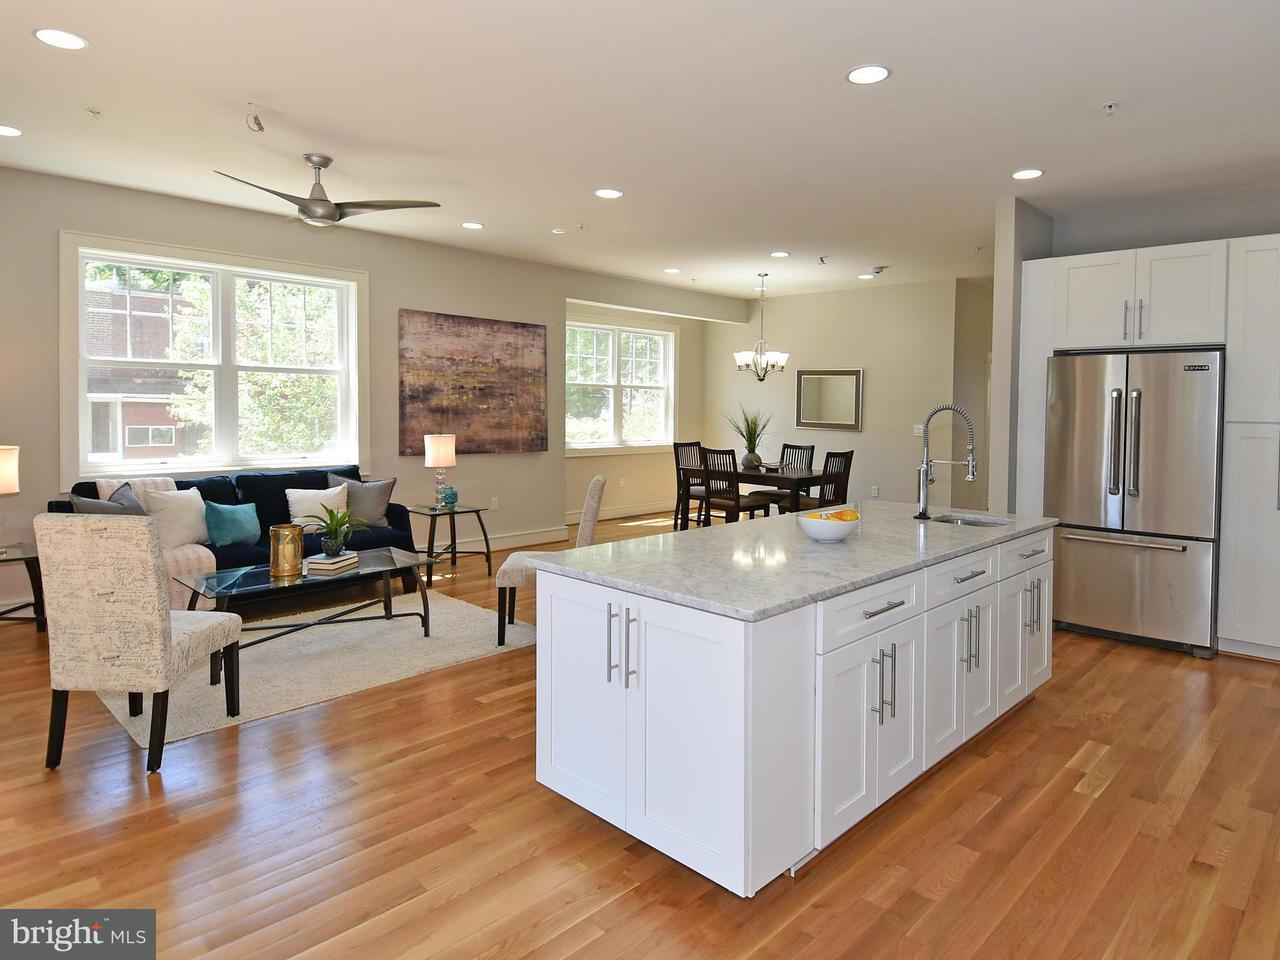 Additional photo for property listing at 4211 12TH PL NE 4211 12TH PL NE Washington, Distretto Di Columbia 20017 Stati Uniti